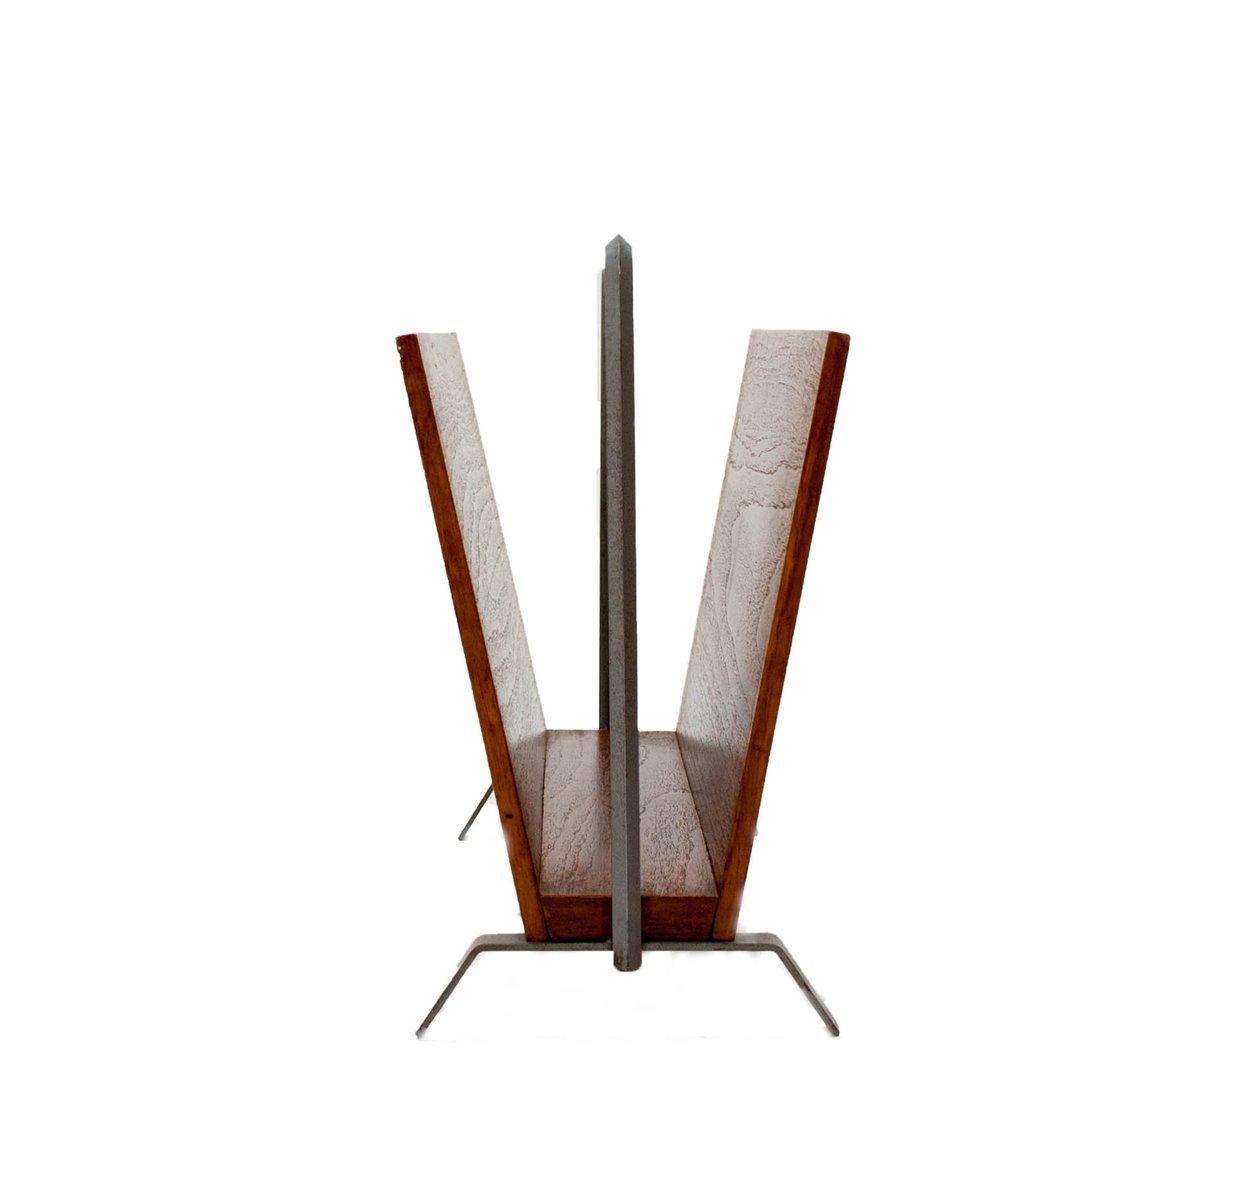 porte revues mid century moderne en teck en vente sur pamono. Black Bedroom Furniture Sets. Home Design Ideas